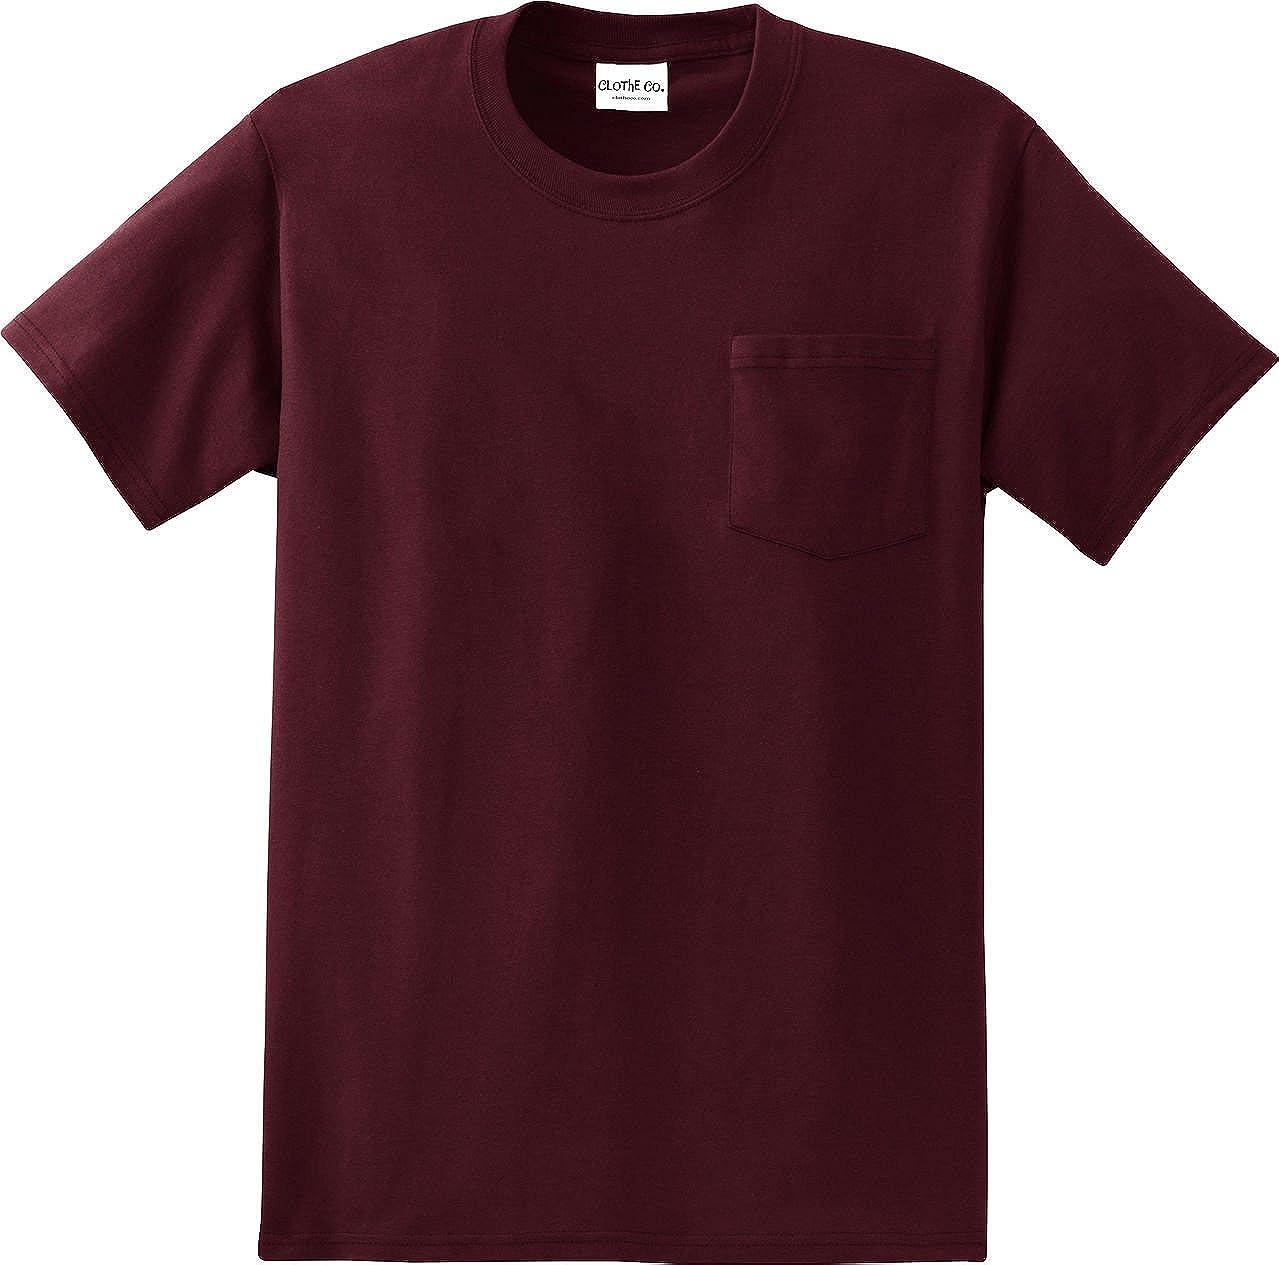 Clothe Co。メンズHeavyweight 100 %コットン半袖ポケットTシャツ B01BK6X3QA S|アスレチックマルーン アスレチックマルーン S